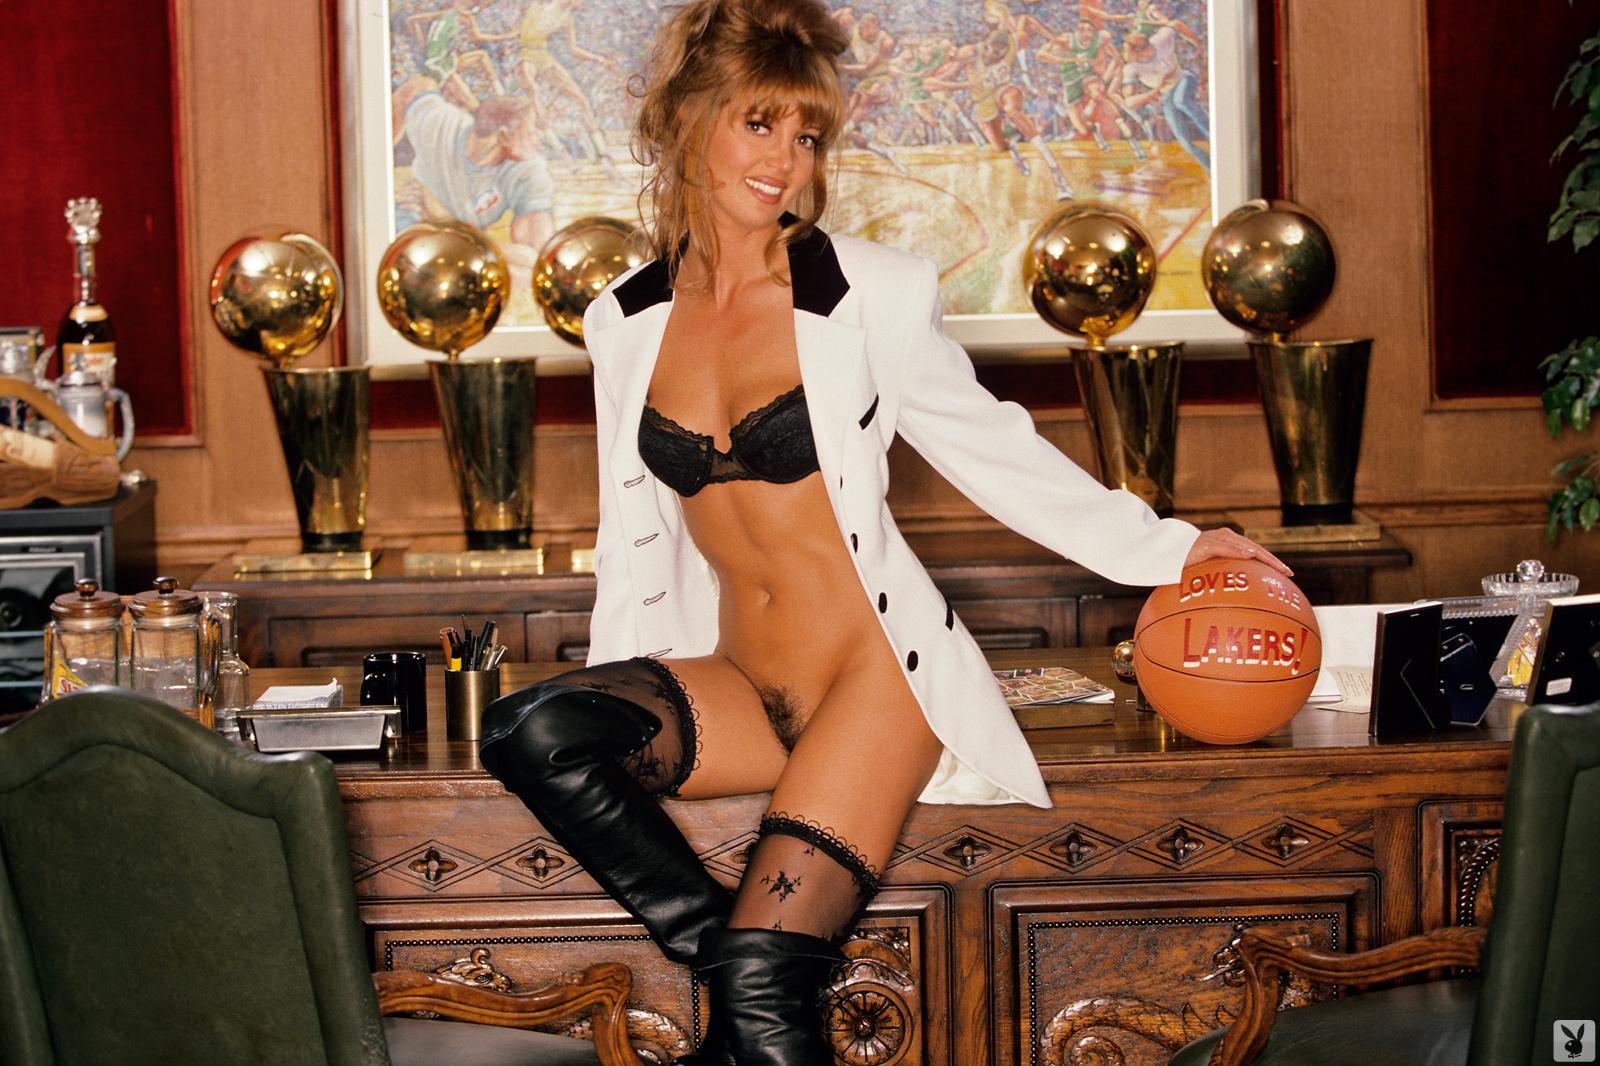 Playboy pics of jeanie buss pics 657